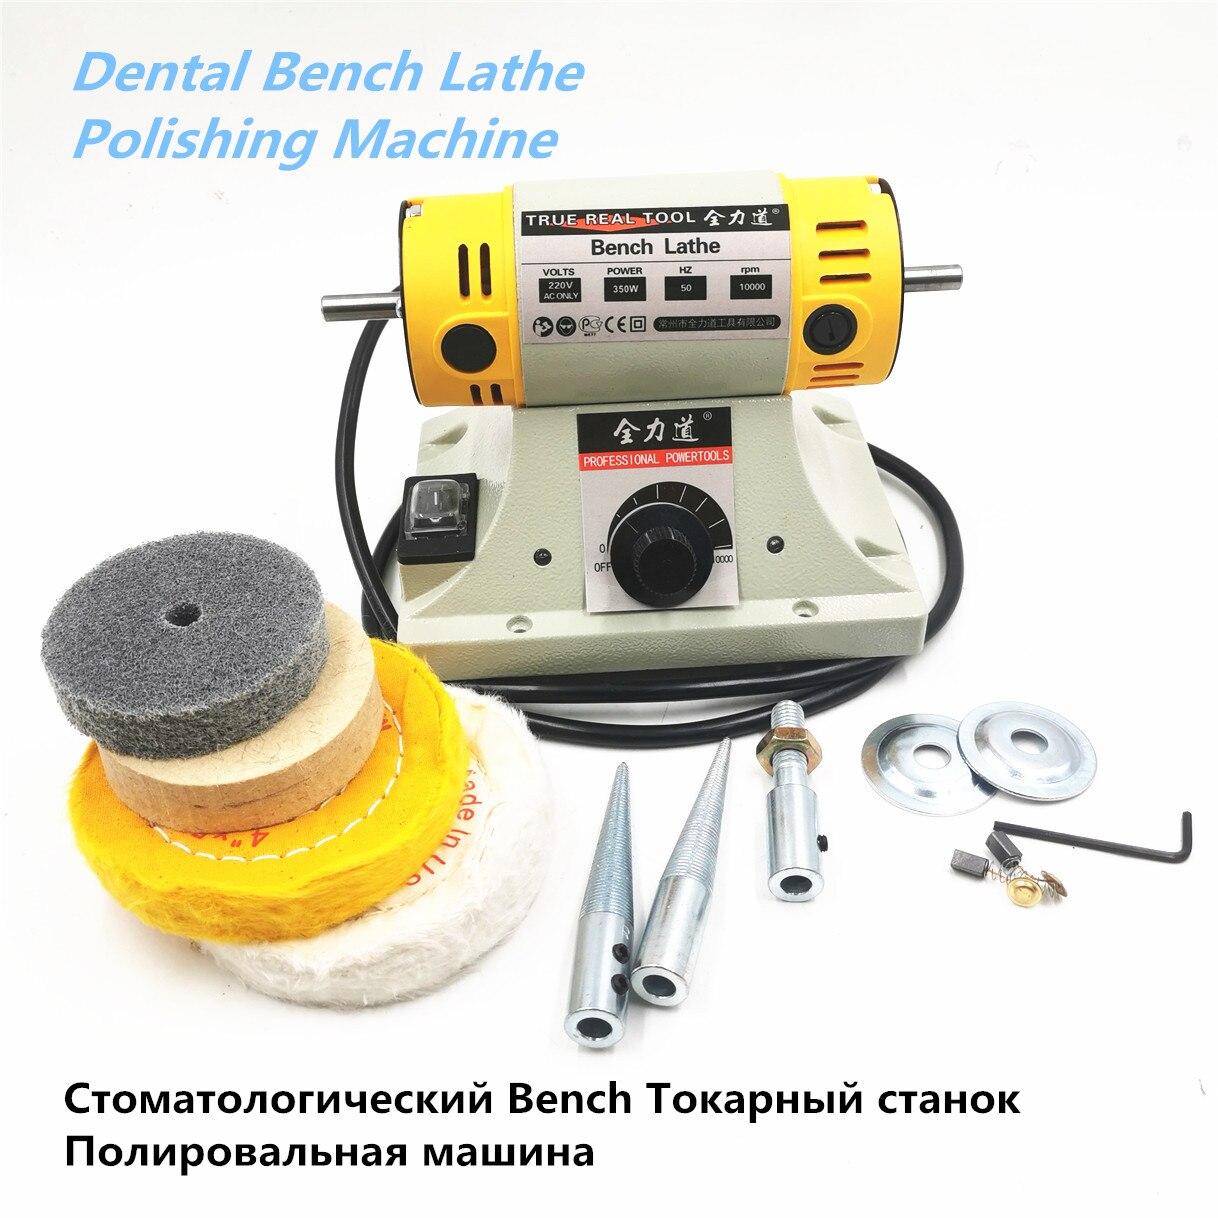 220 v 350 ワット研磨機 diy 木工 jadejewelry 歯科ベンチ旋盤モーター研削盤